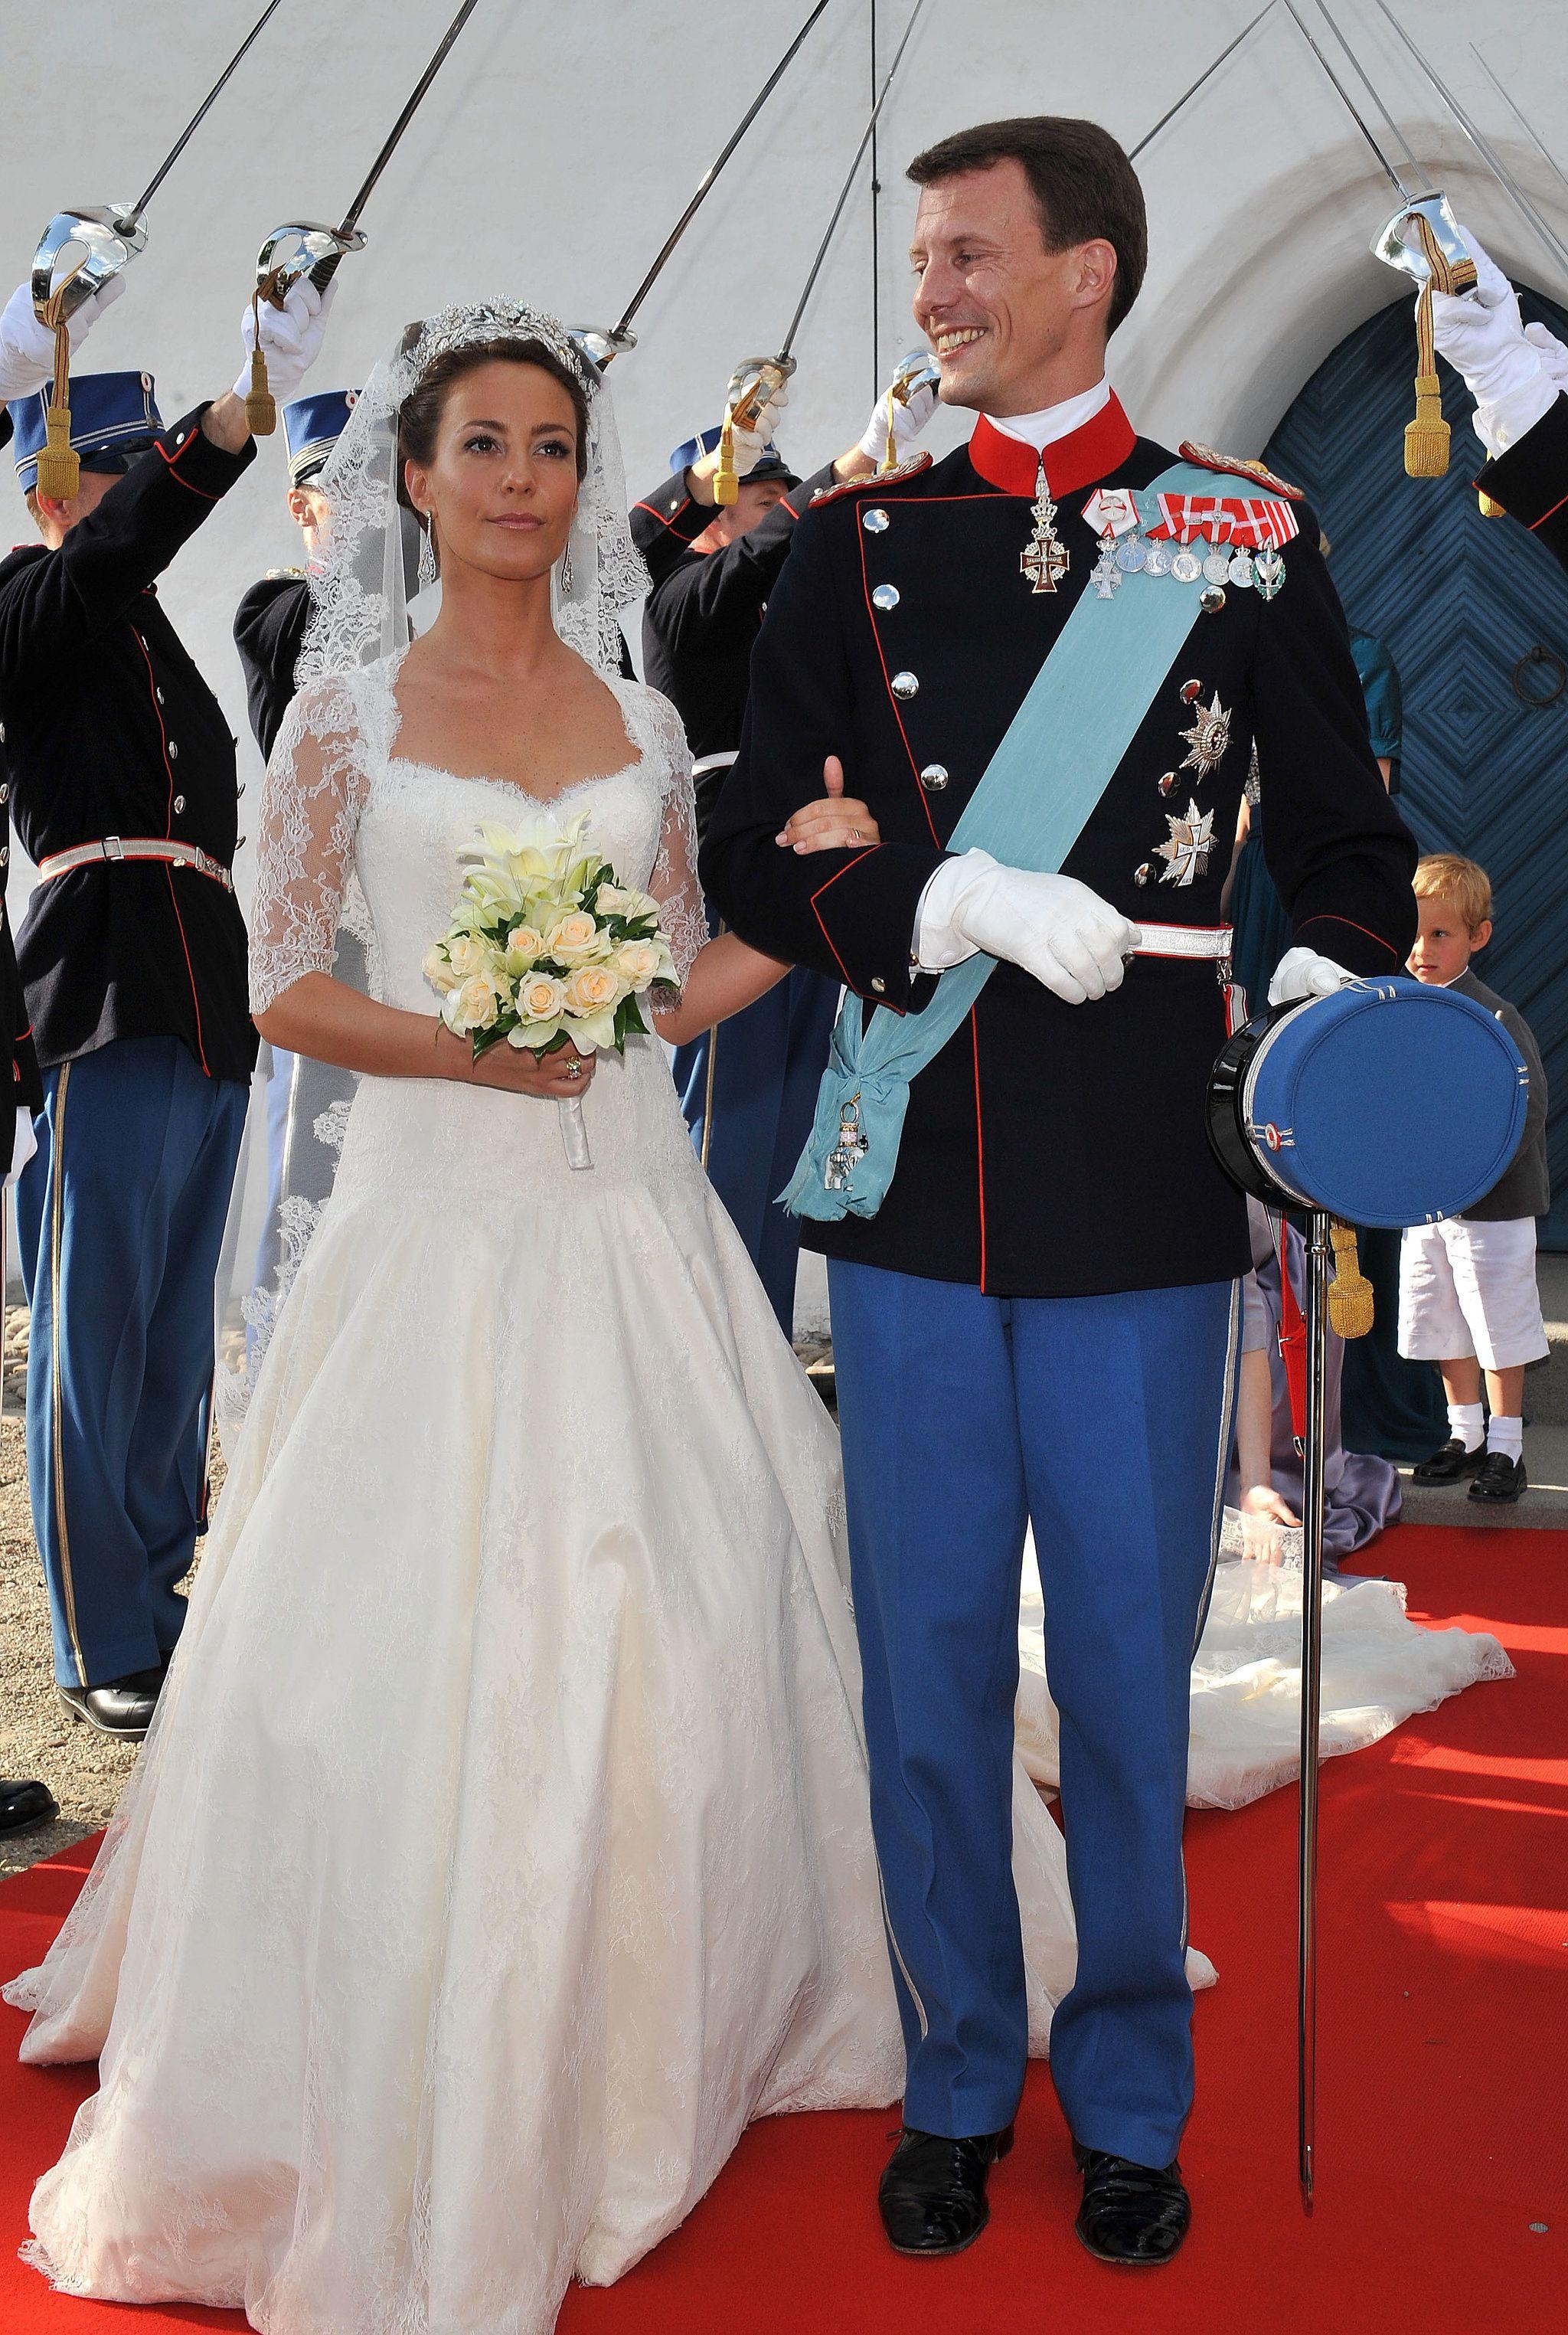 Princess Marie Of Denmark 2008 Royal Wedding Dress Princess Wedding Gown Princess Marie Of Denmark